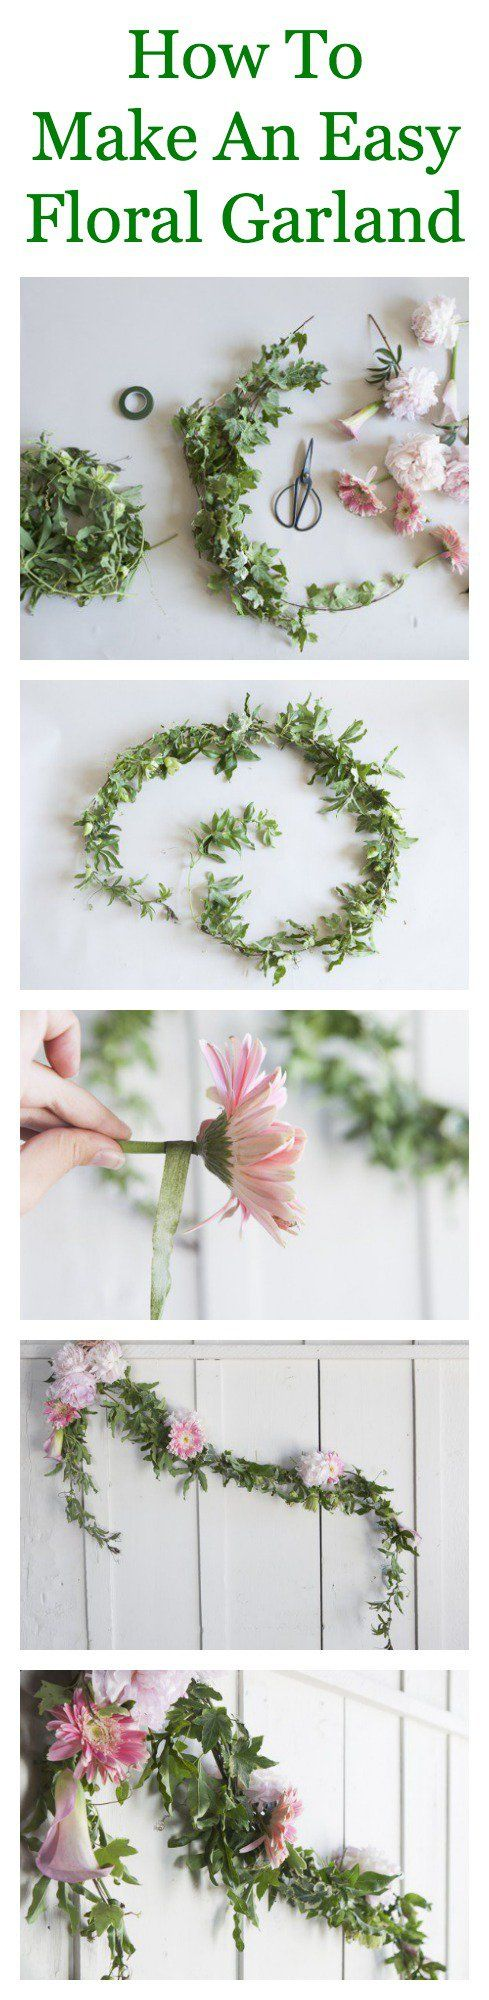 How To Make A Floral Garland Floral garland, Flower